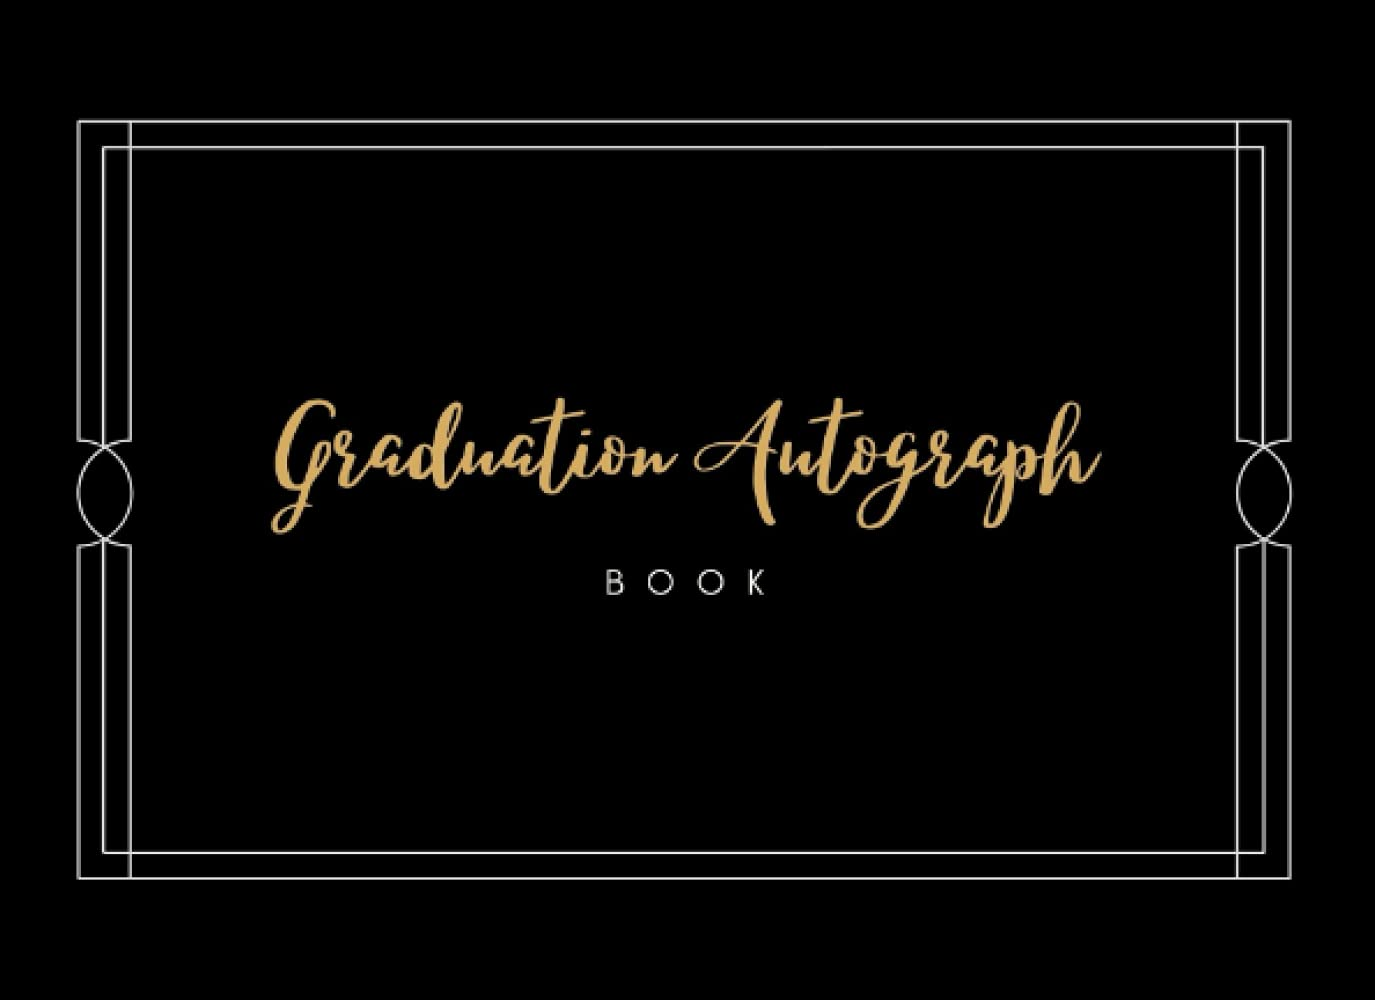 51iQjBxsMxS - Graduation Autograph Book: Signature Collection,150 Blank Unlined book, Size 8.25X6 Inch. Classroom, Celebrities, Sports, Graduation